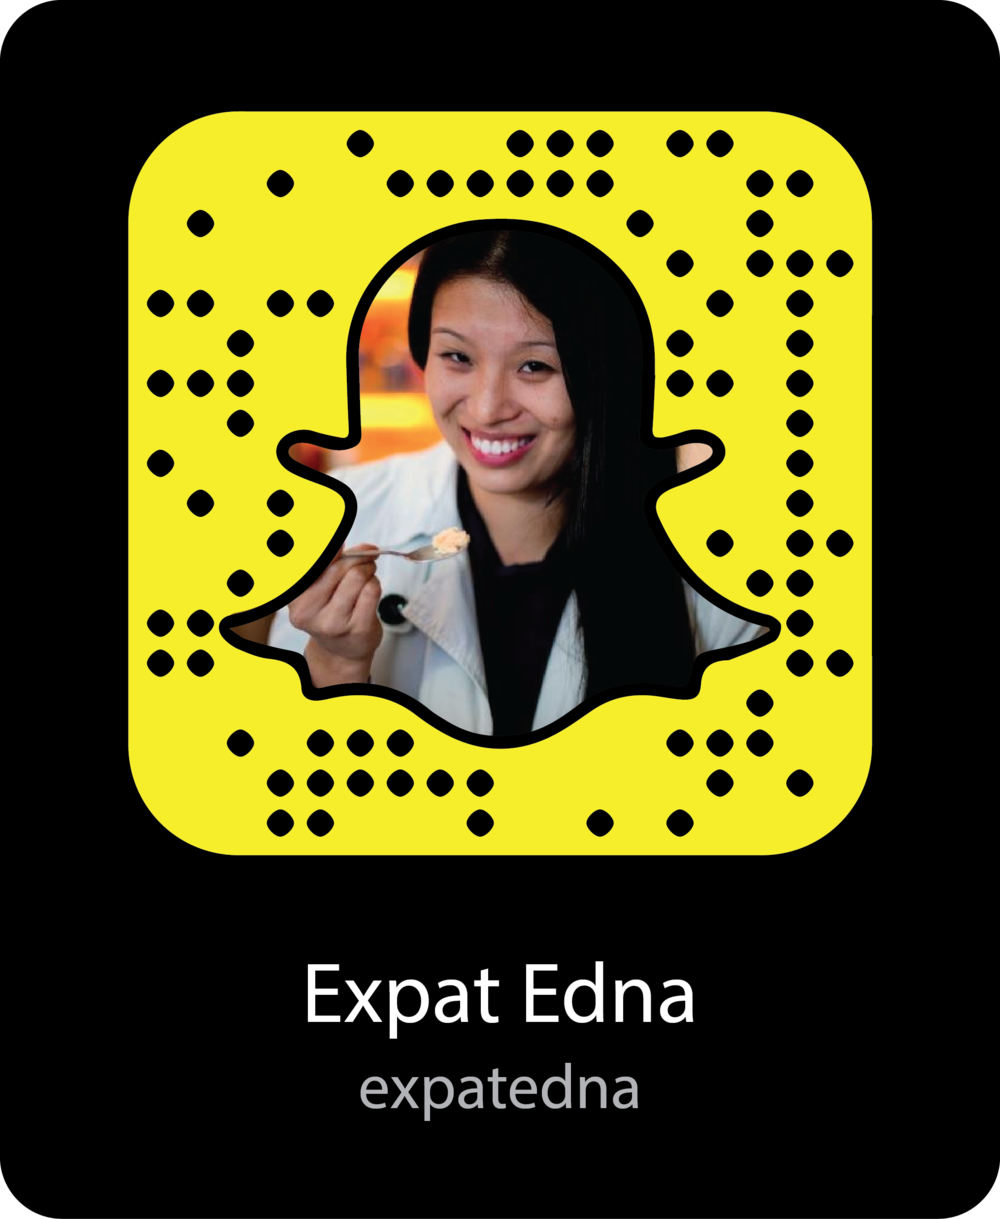 ExpatEdna-Travel-snapchat-snapcode.png